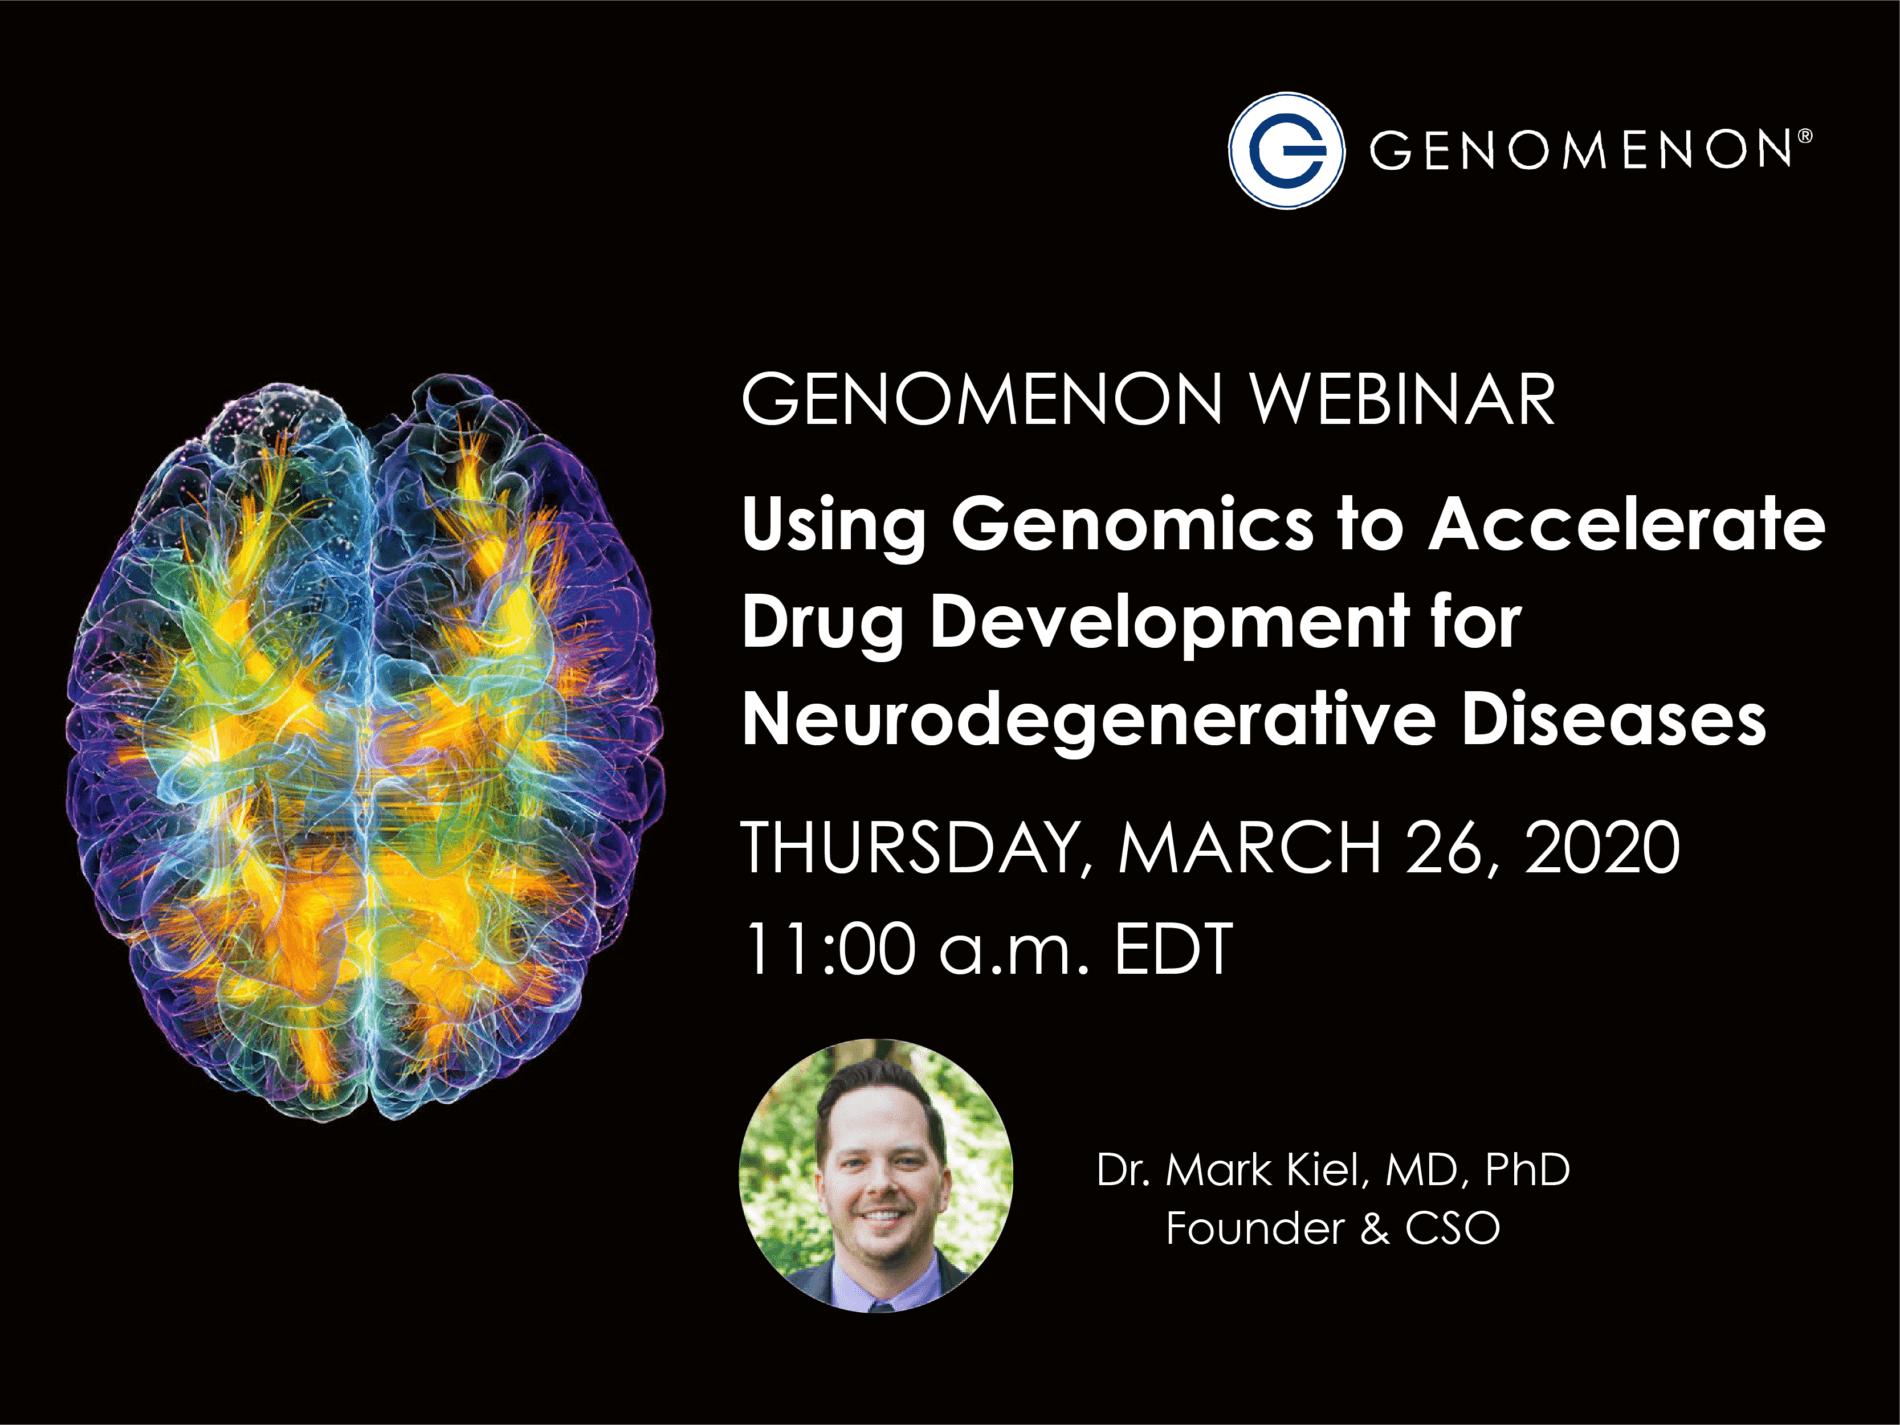 <h2><b>Upcoming Webinar:</h2> </b><Br> <h4><i>Using Genomics to Accelerate Drug Development for Neurodegenerative Diseases</h4></i><br>